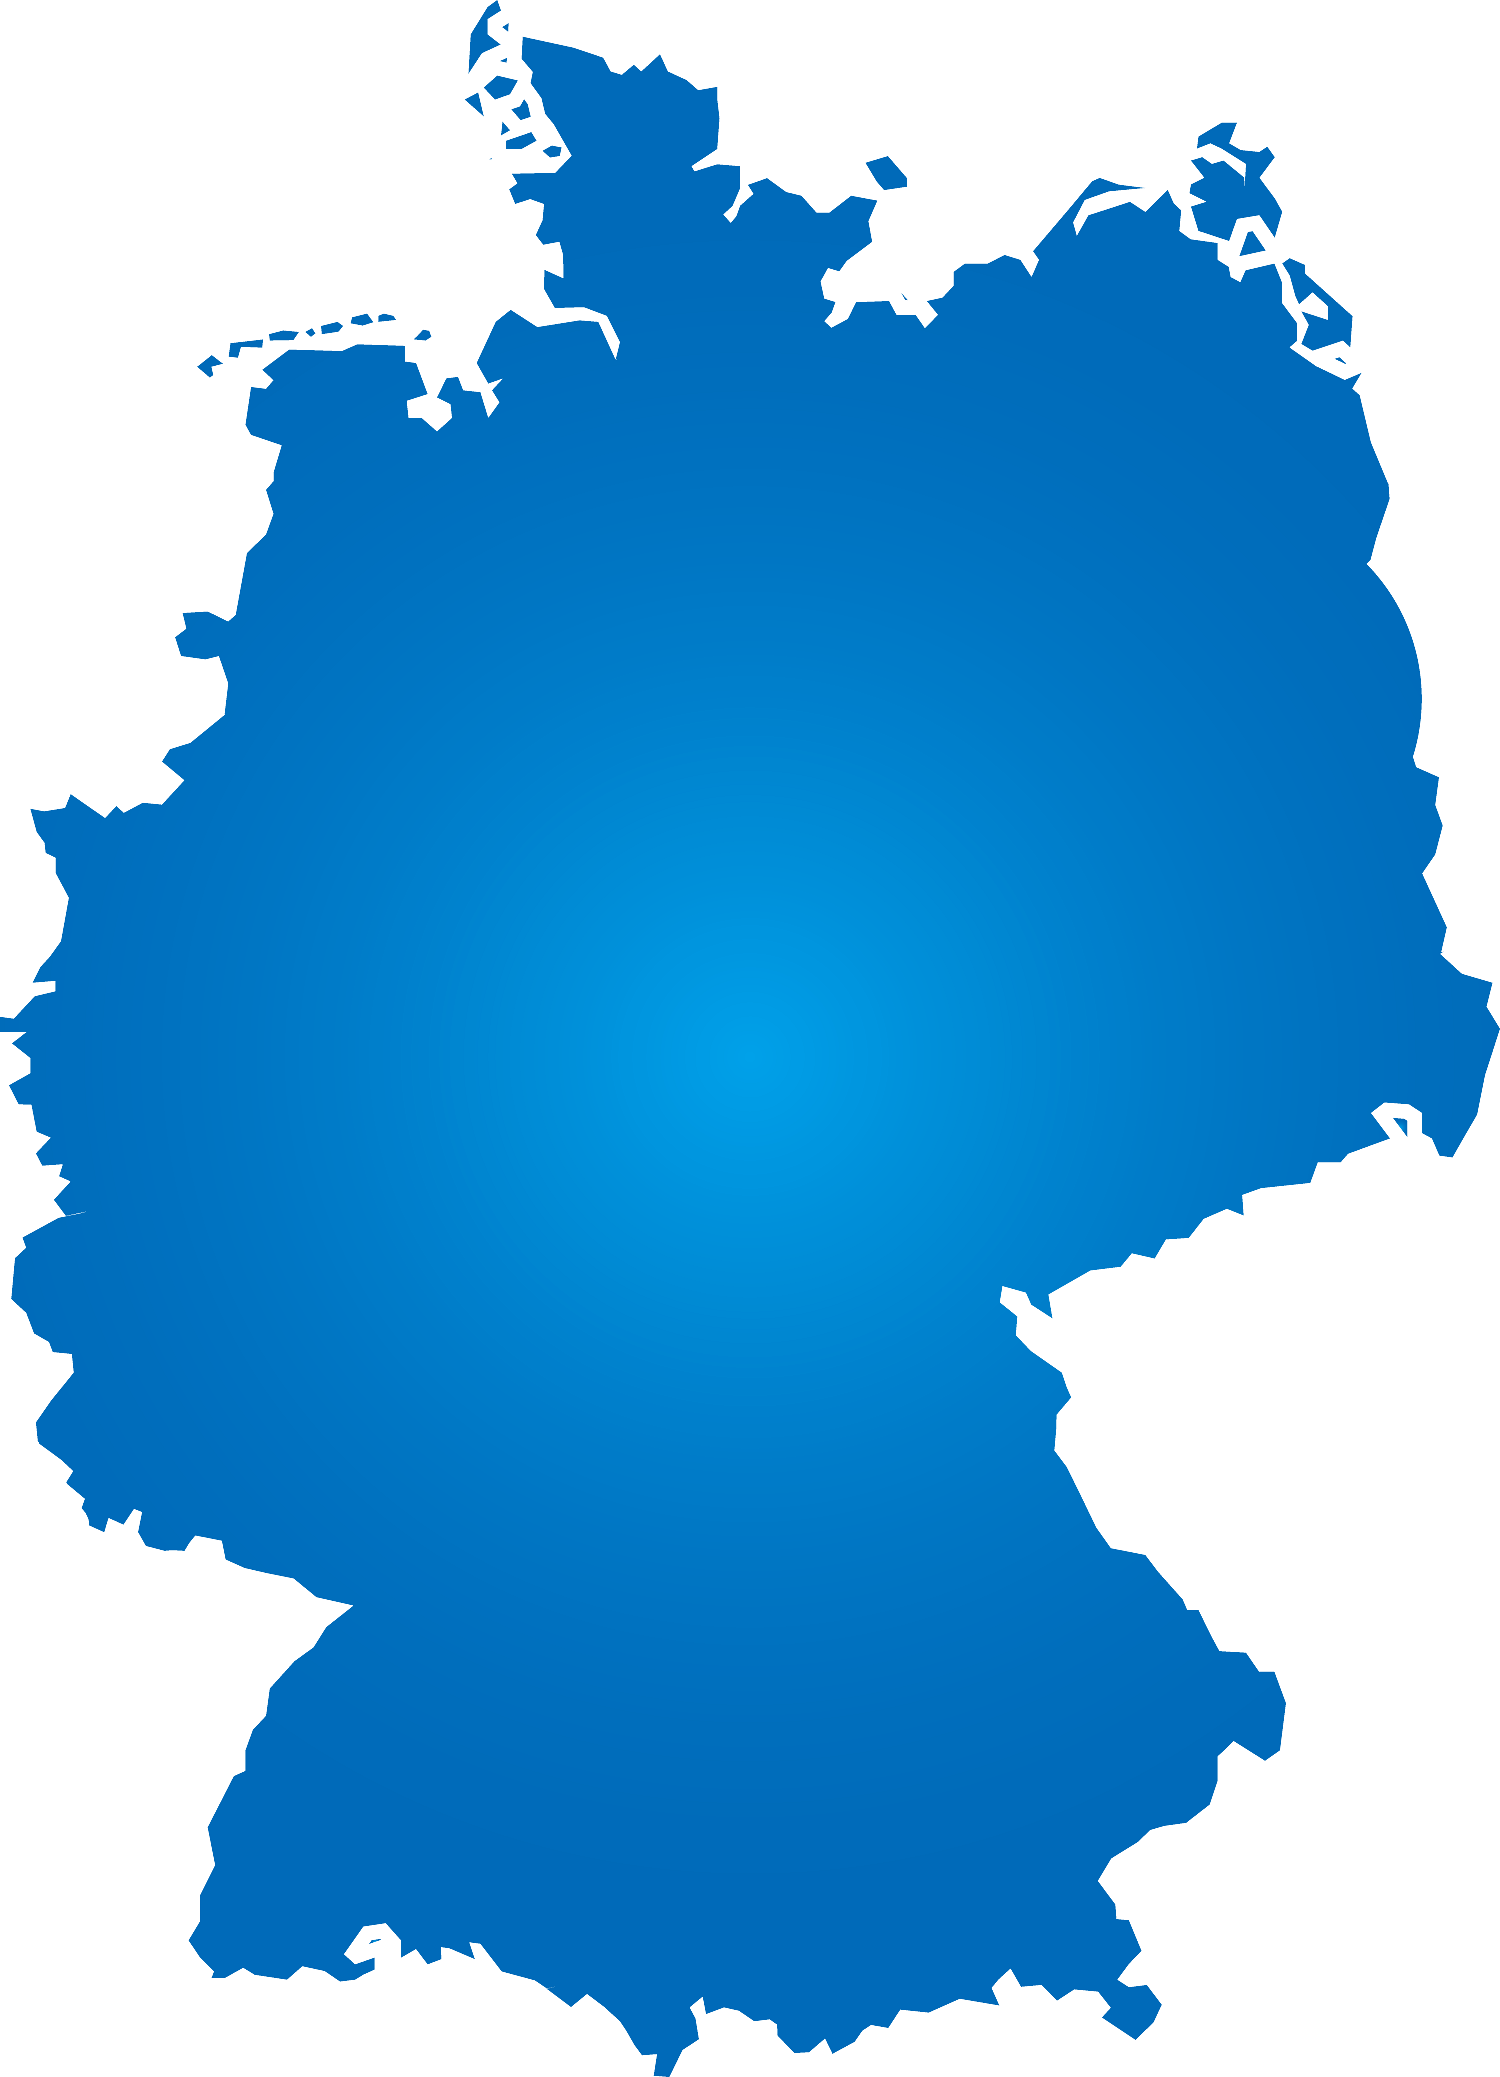 Standorte des Sportgeräteservice